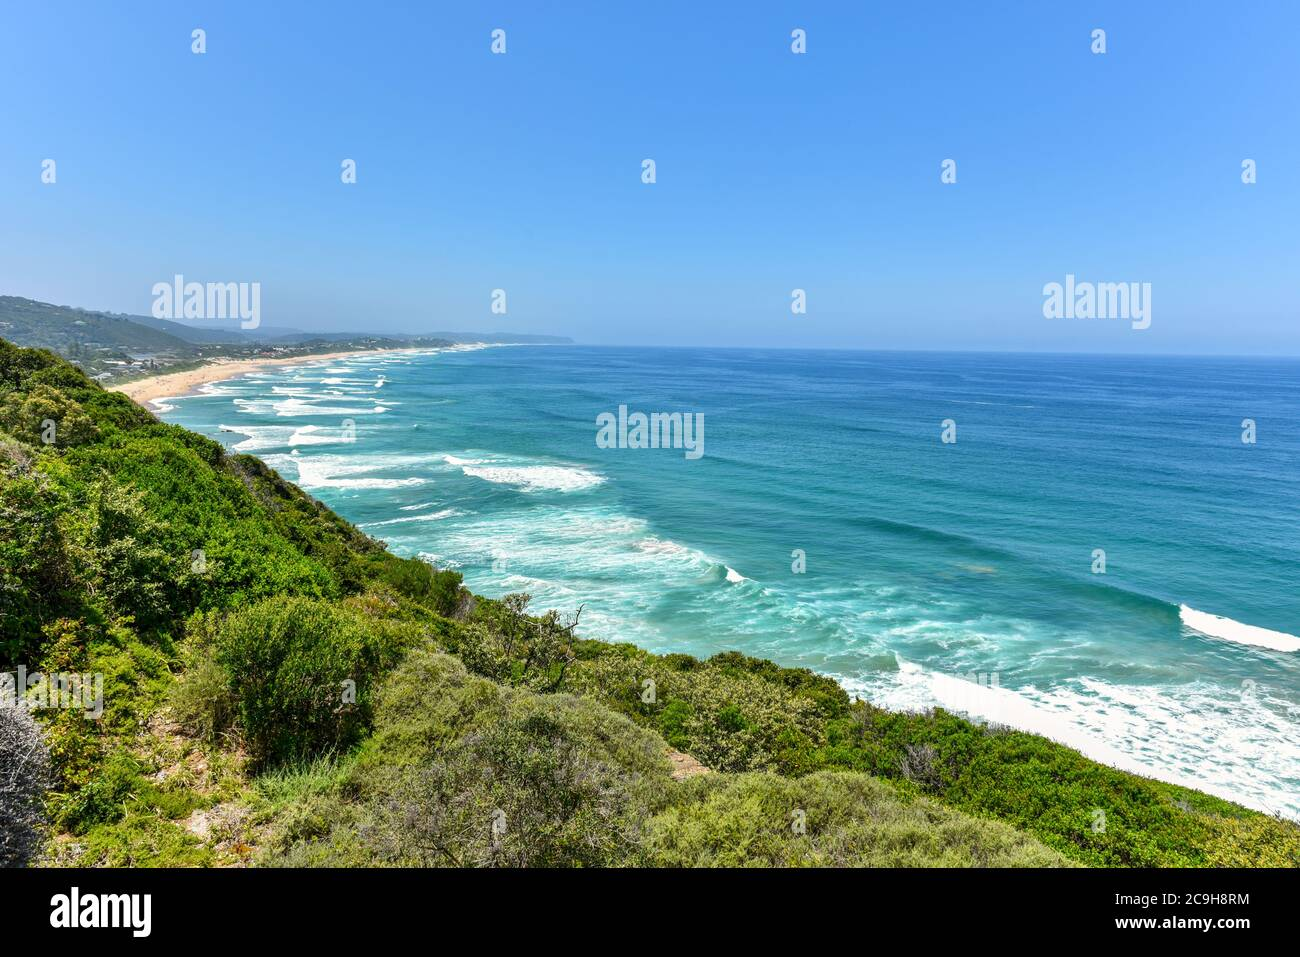 Wilderness Coastline, Garden Route, South Africa Stock Photo